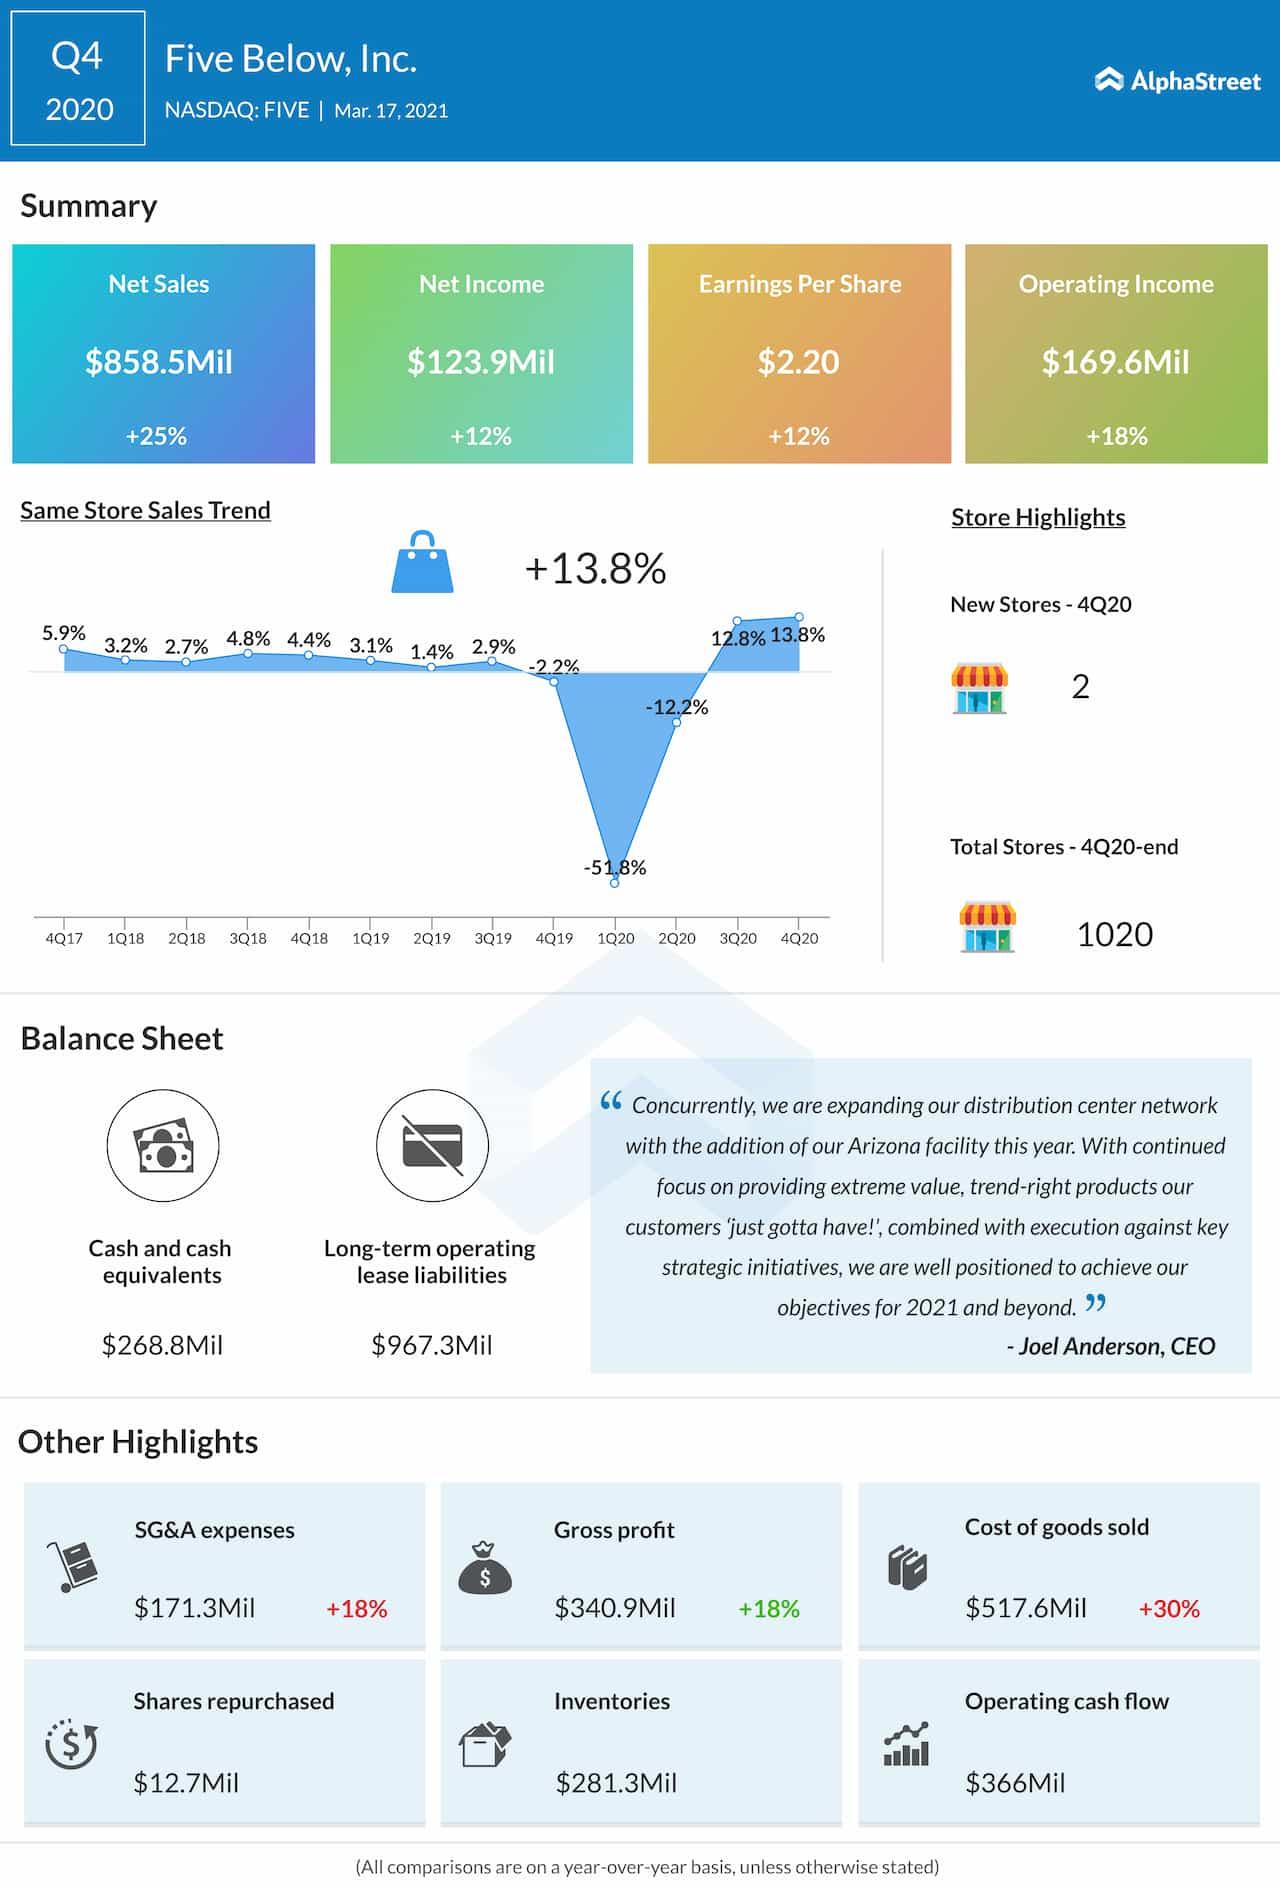 Five Below Q4 2020 earnings infographic